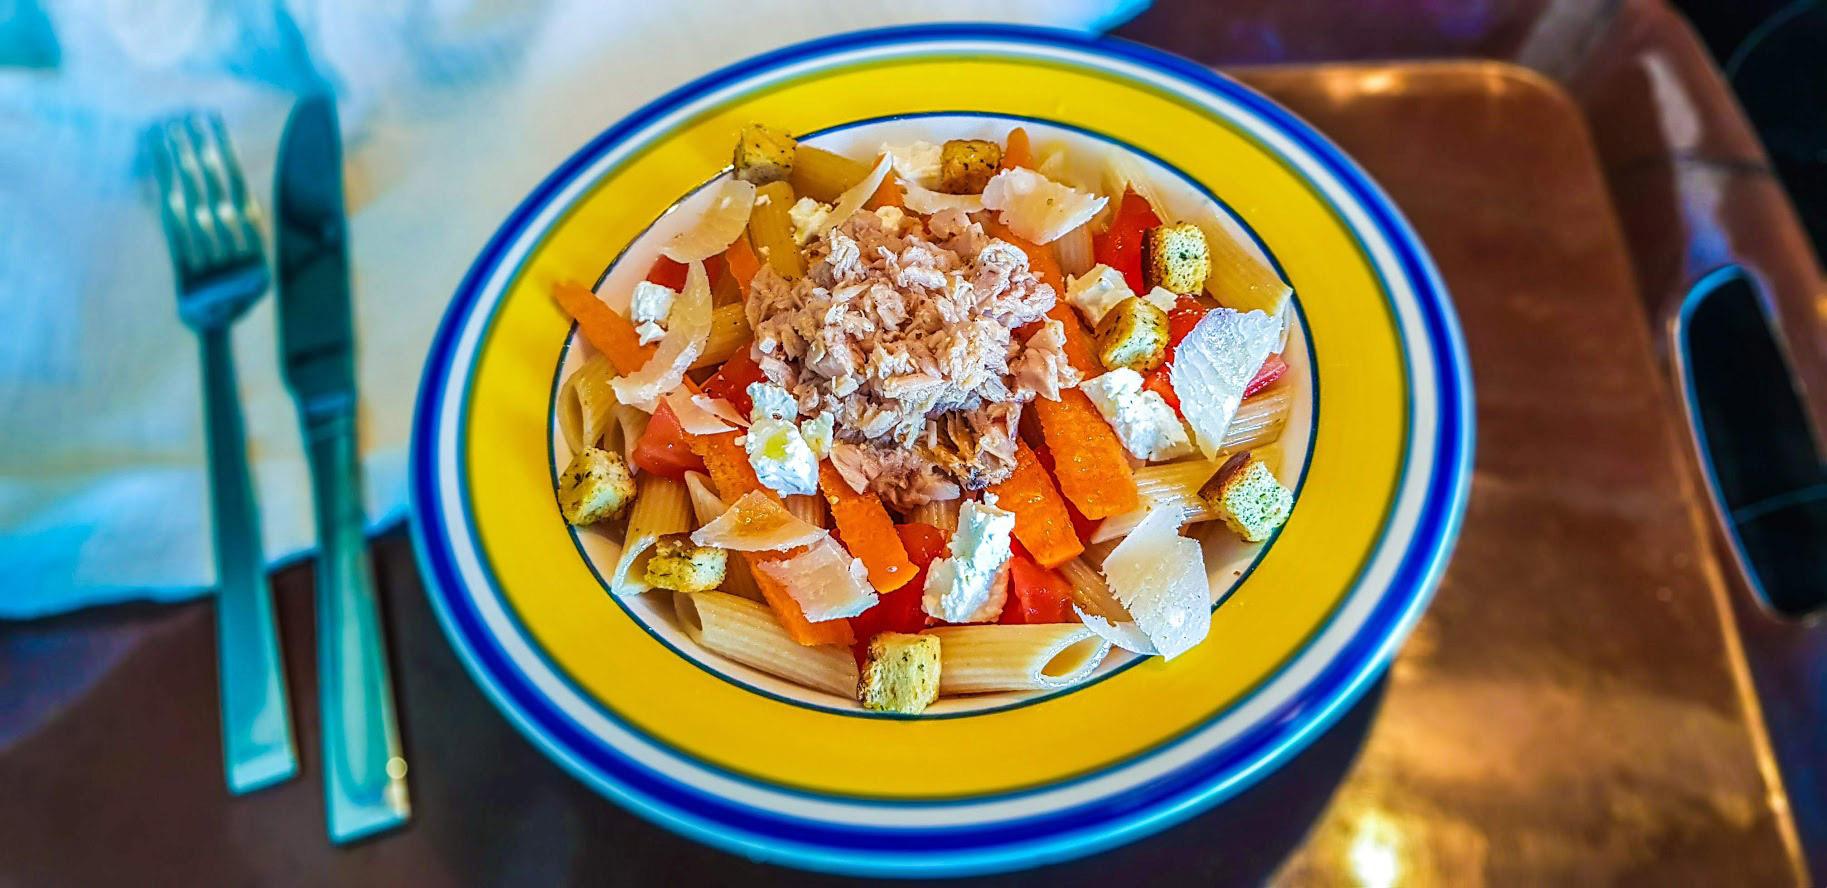 Salade de pâtes au thon, tomate, et fromage féta